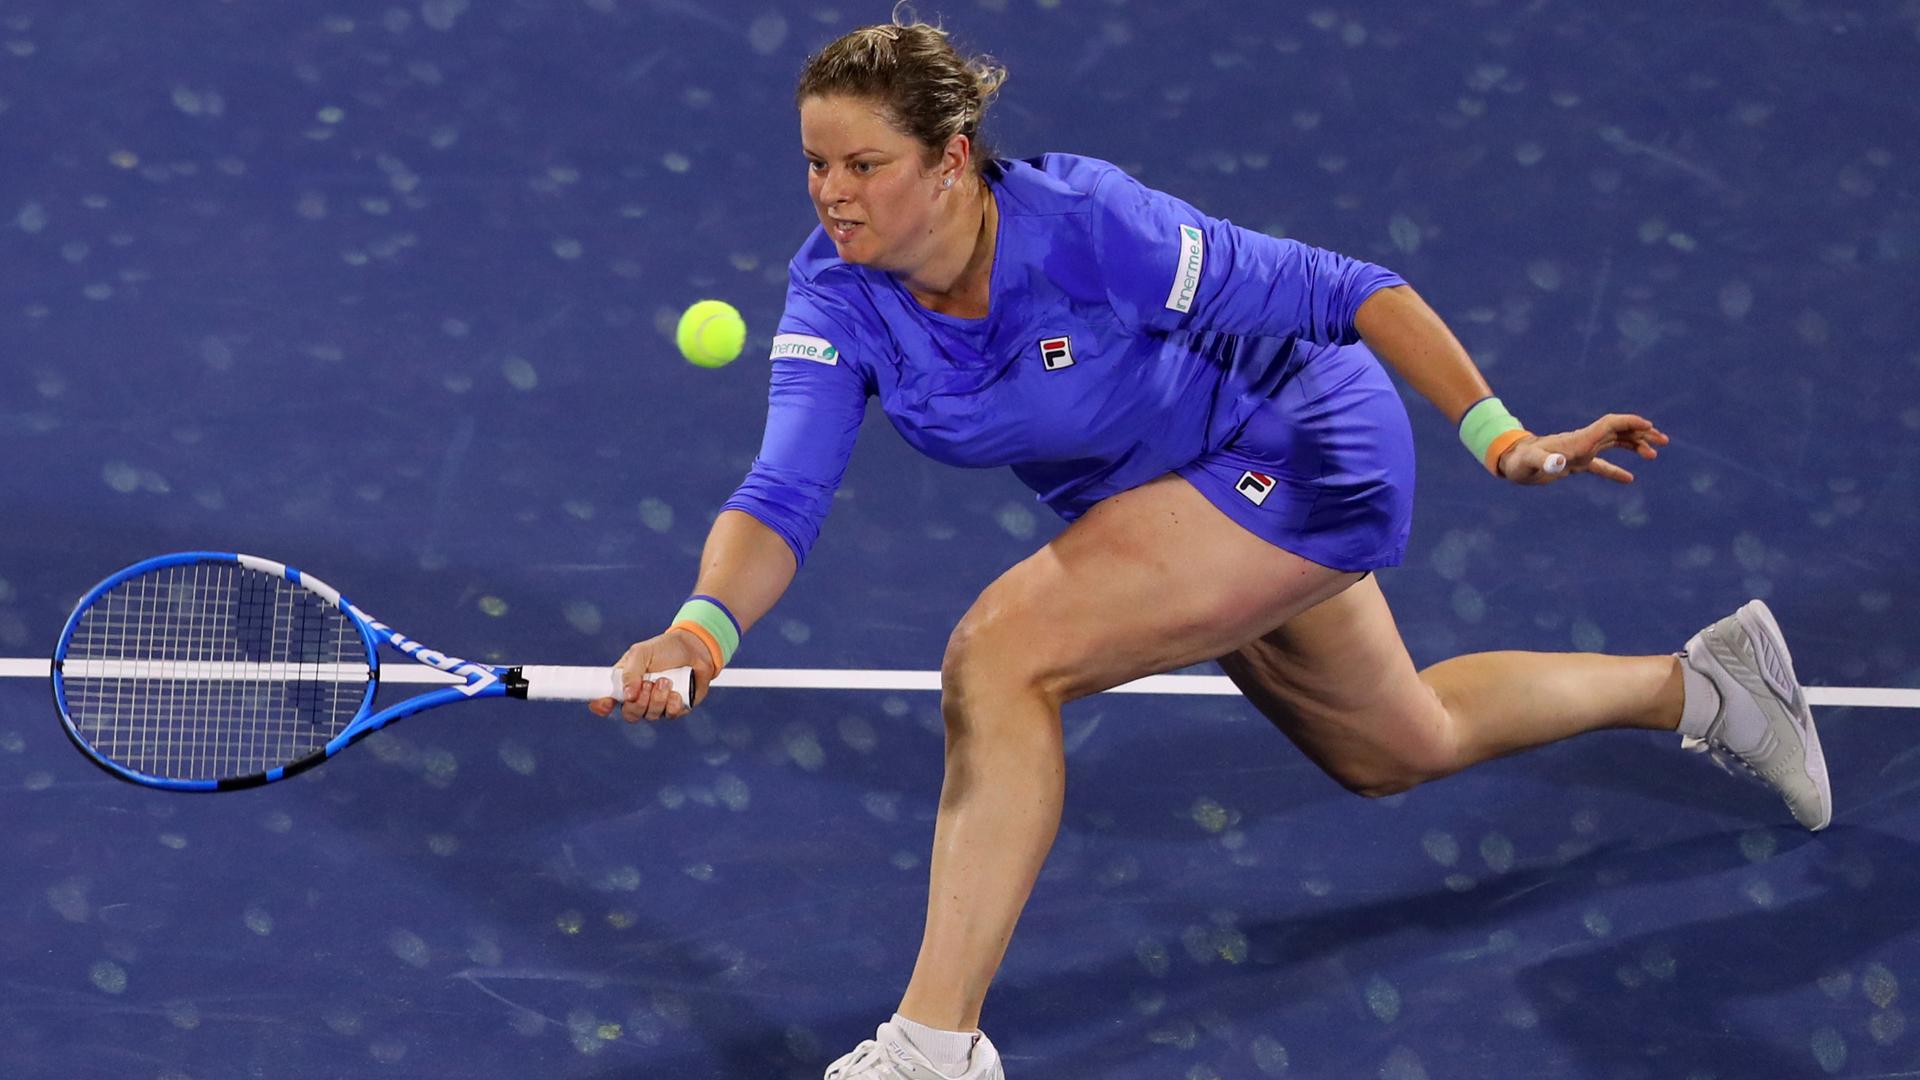 Clijsters beaten again as comeback continues, Azarenka falls in Monterrey